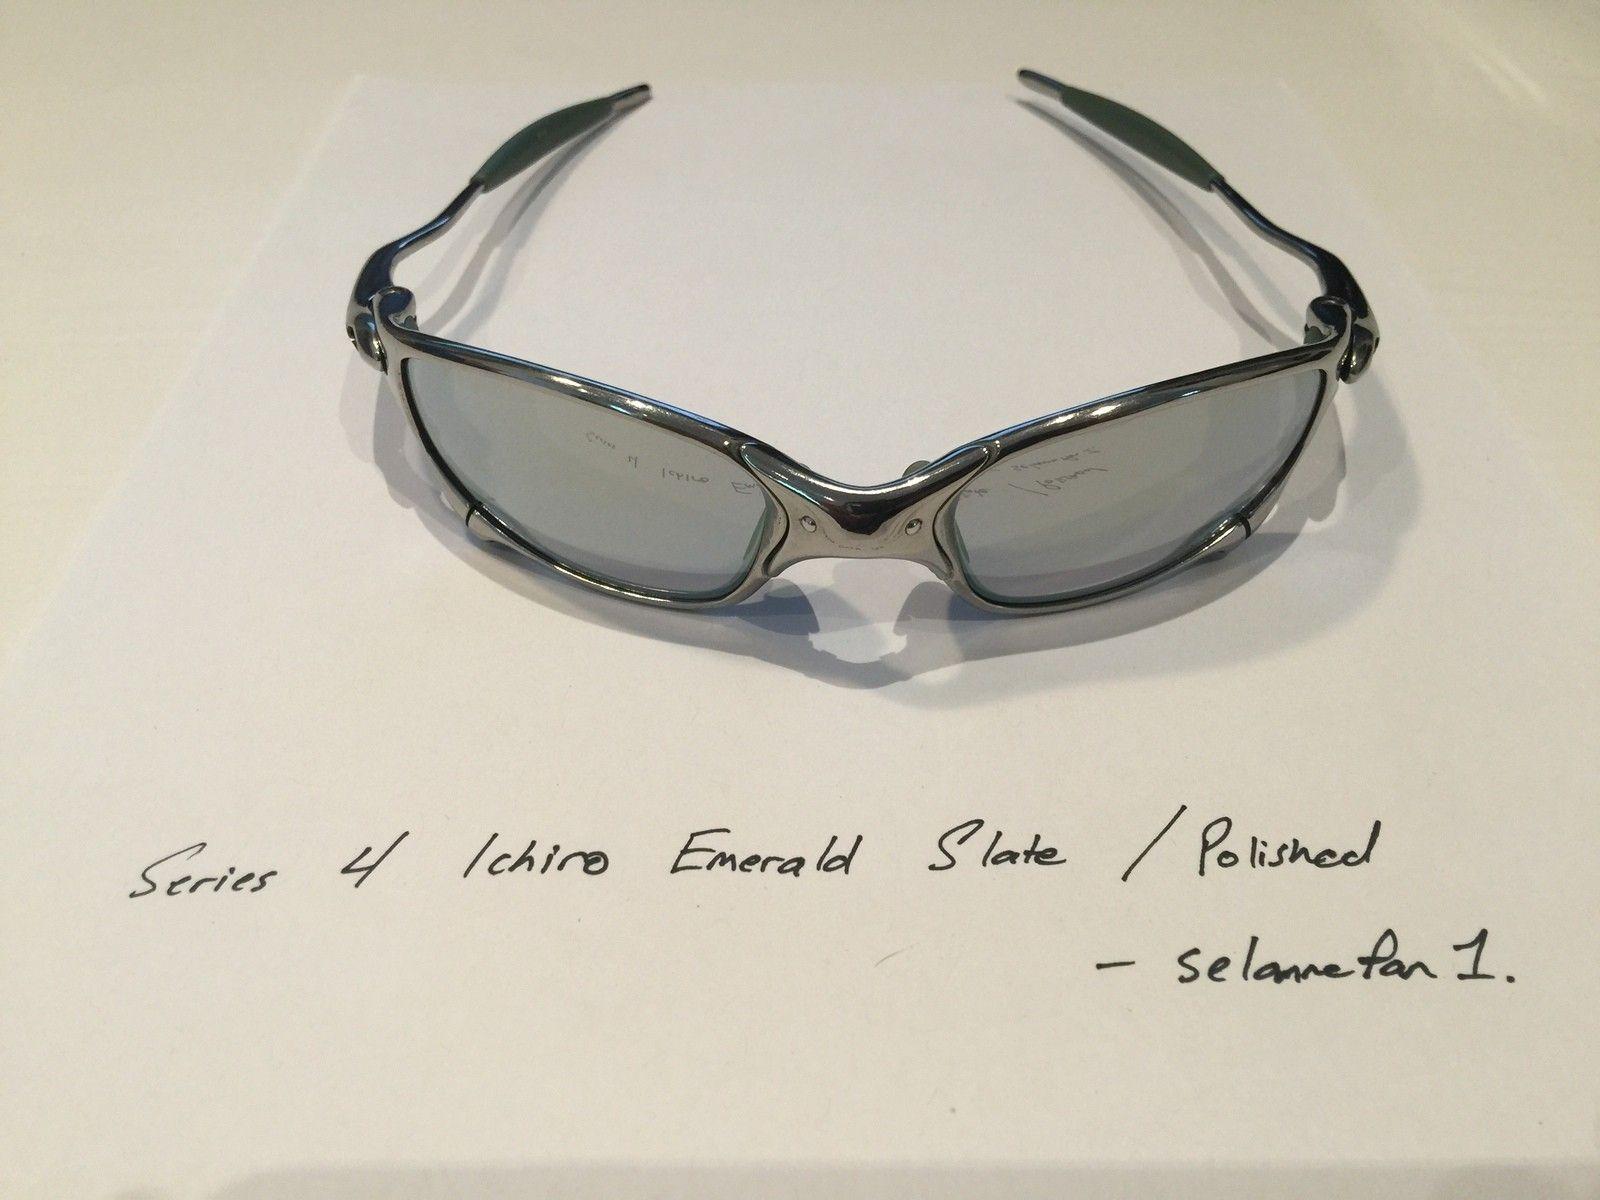 Ichiro Emerald Slate / Polished Frame Juliets (with box) - IMG_3814.JPG